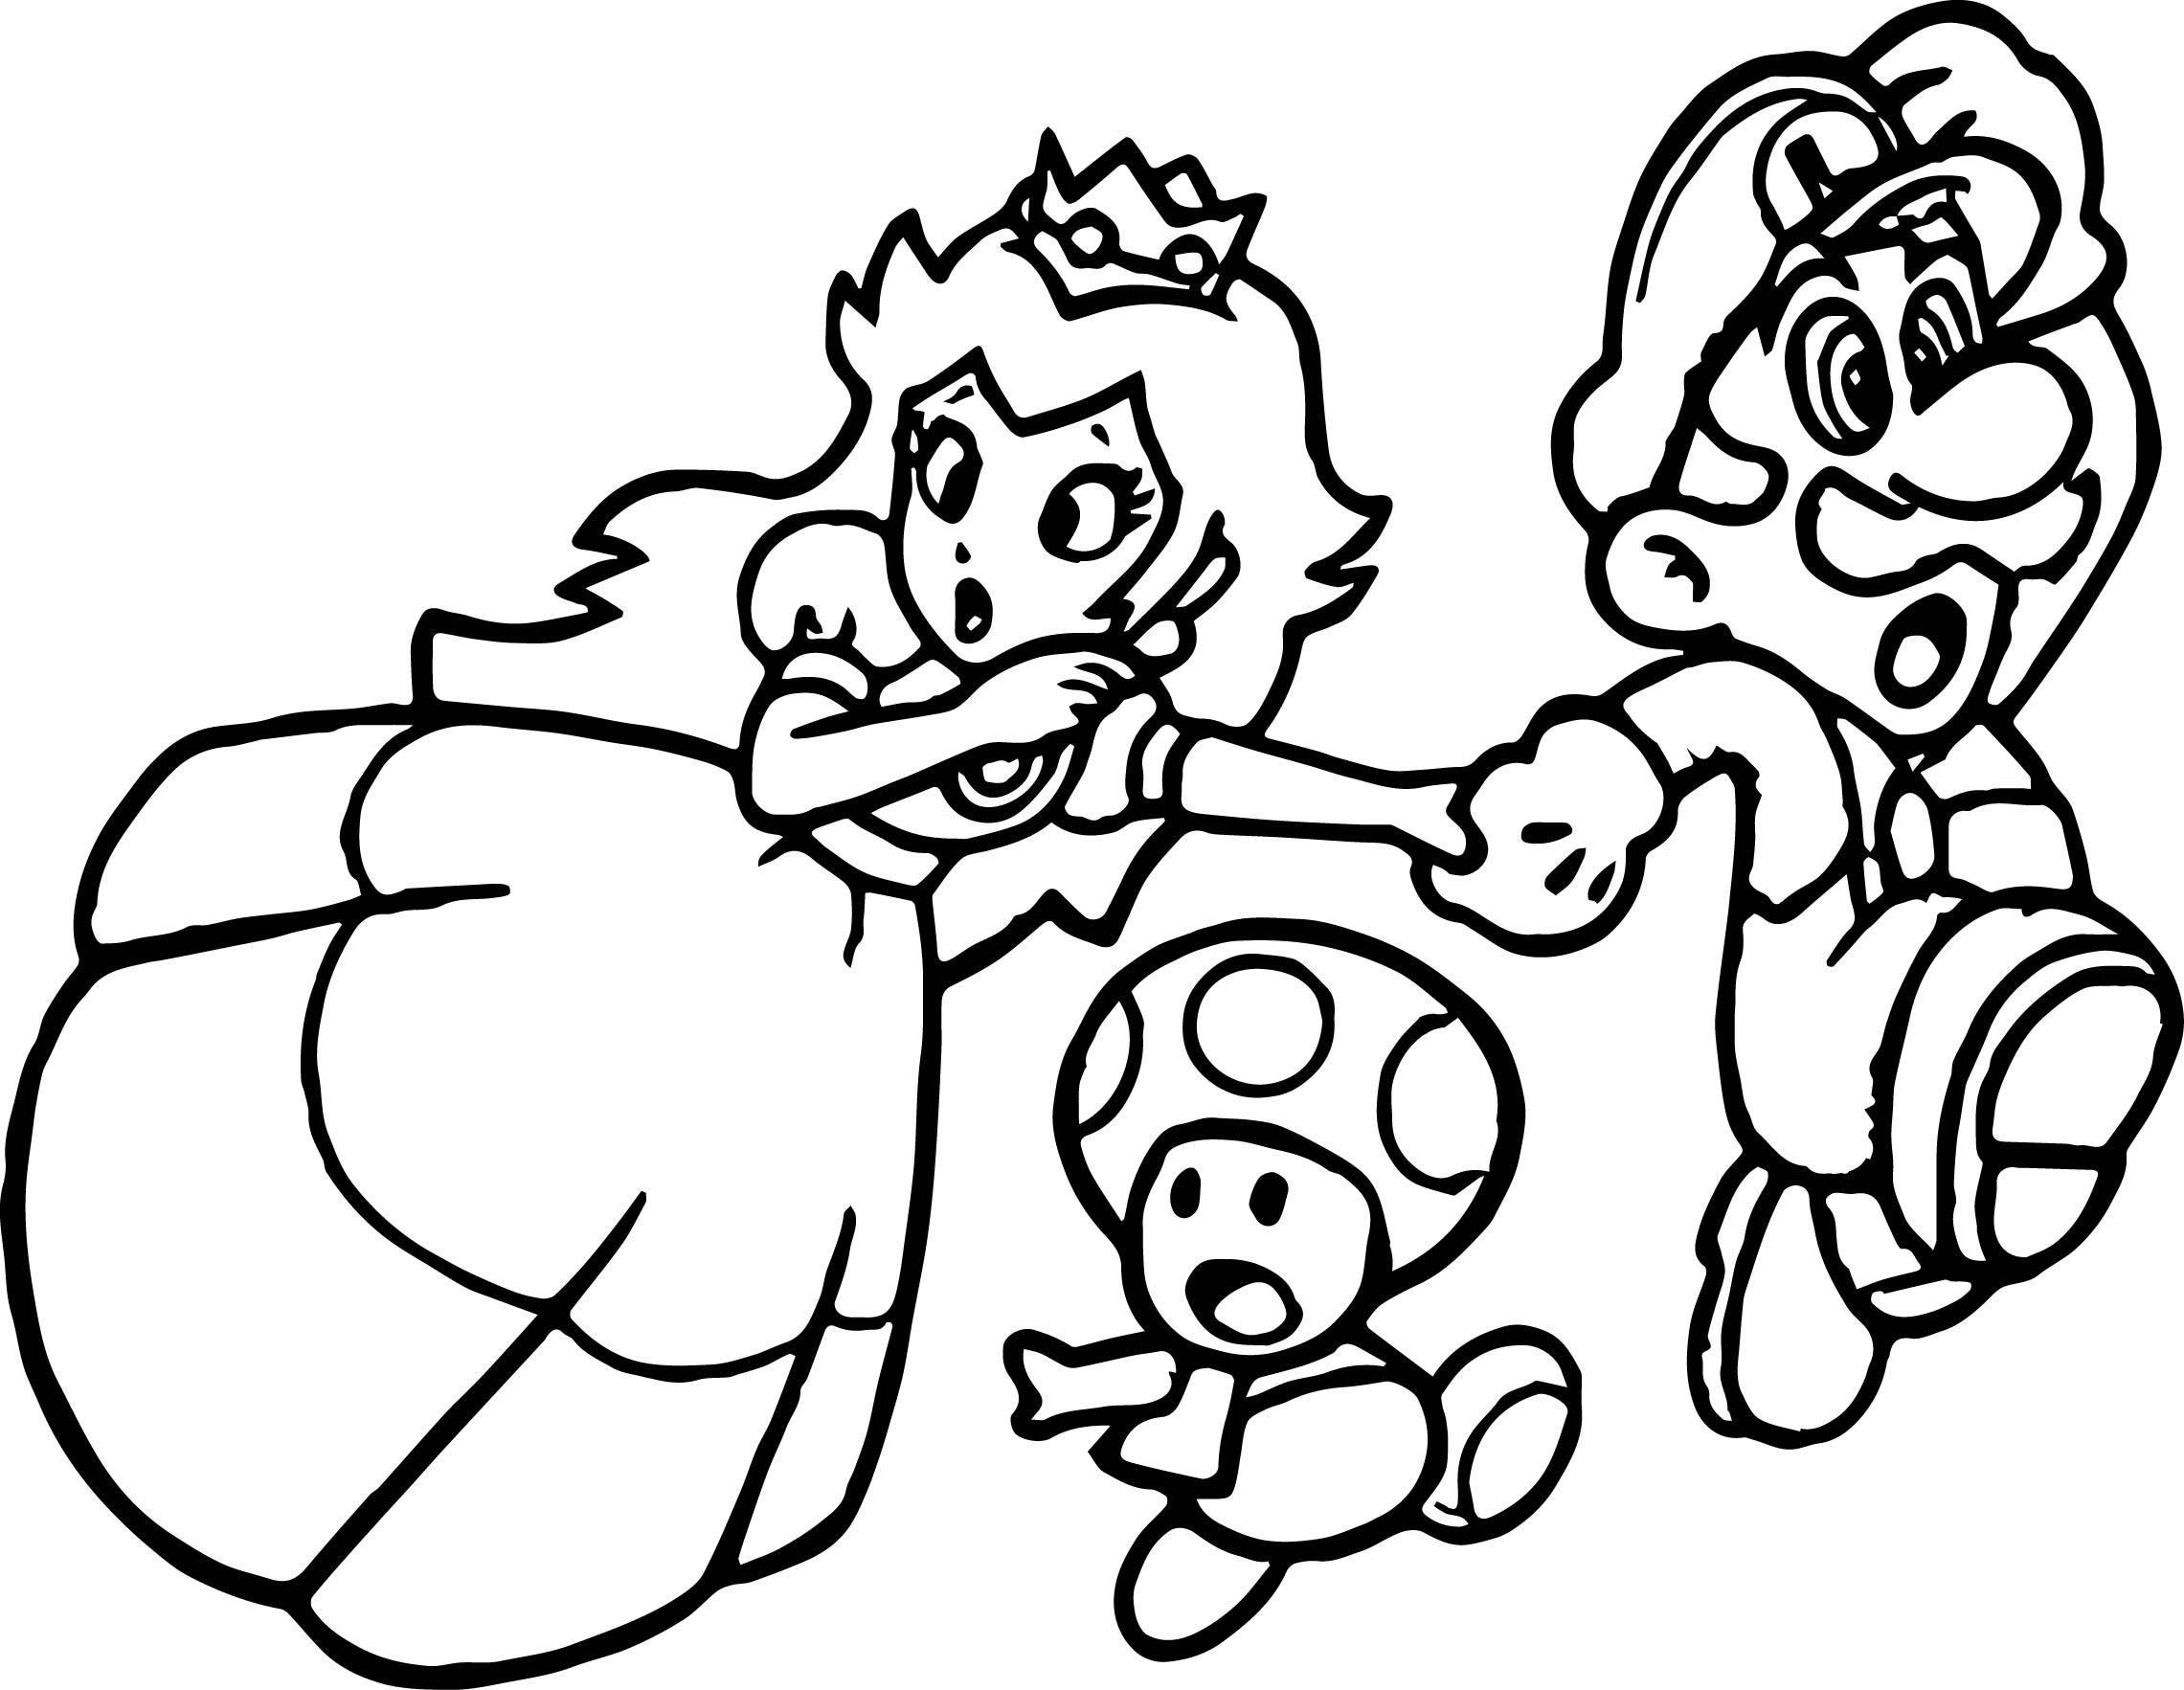 Super Mario Princess Mushroom Coloring Page Wecoloringpage.com ...